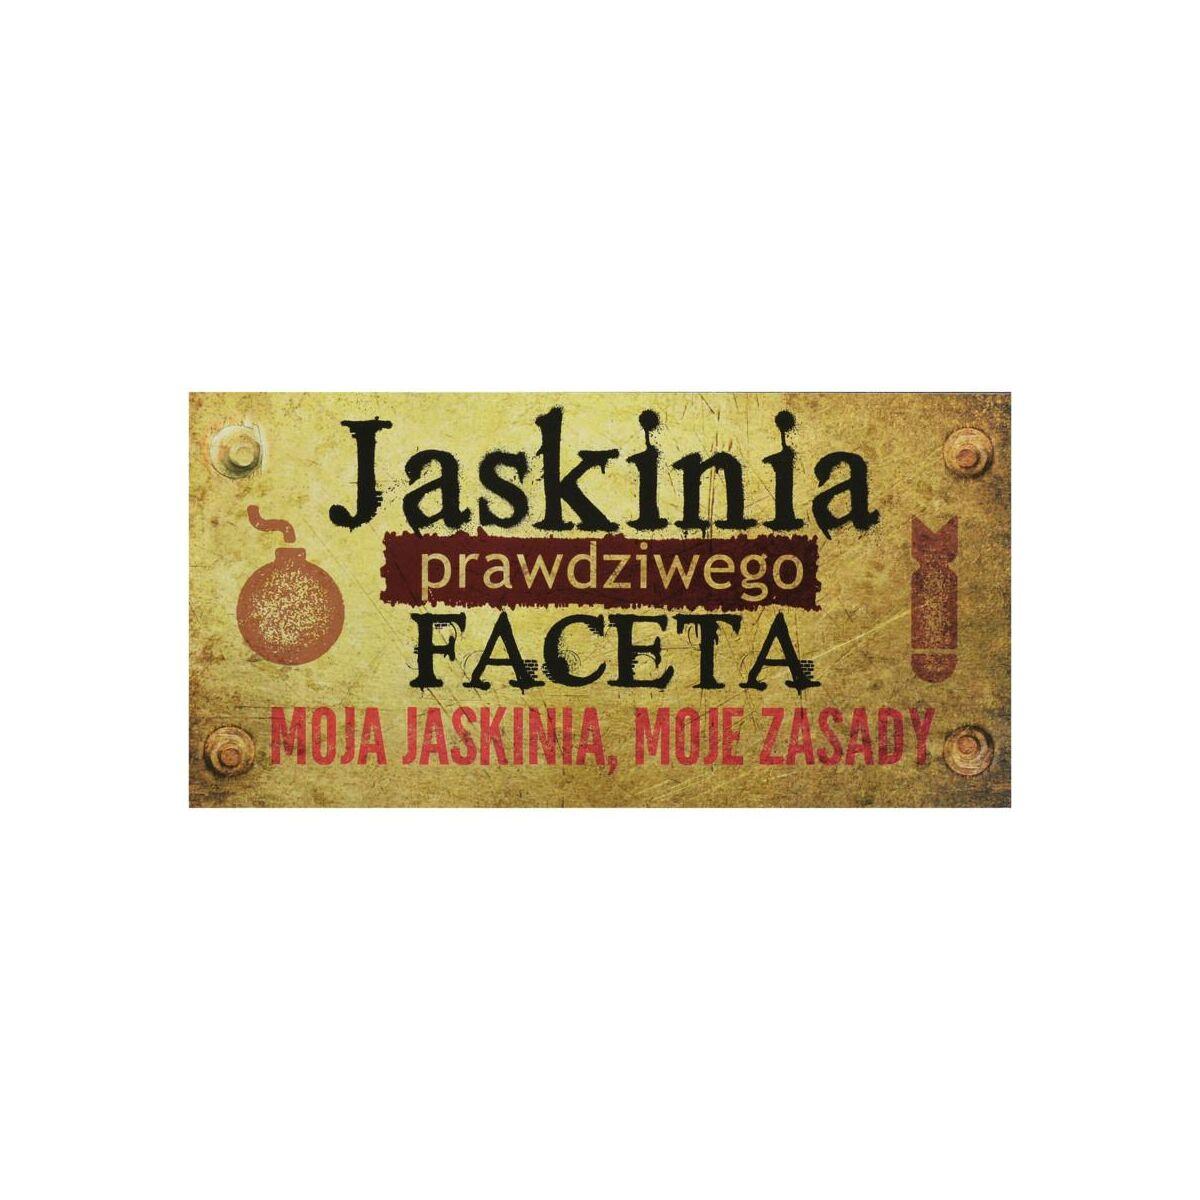 Tabliczka JASKINIA FACETA  19.5 x 1 cm